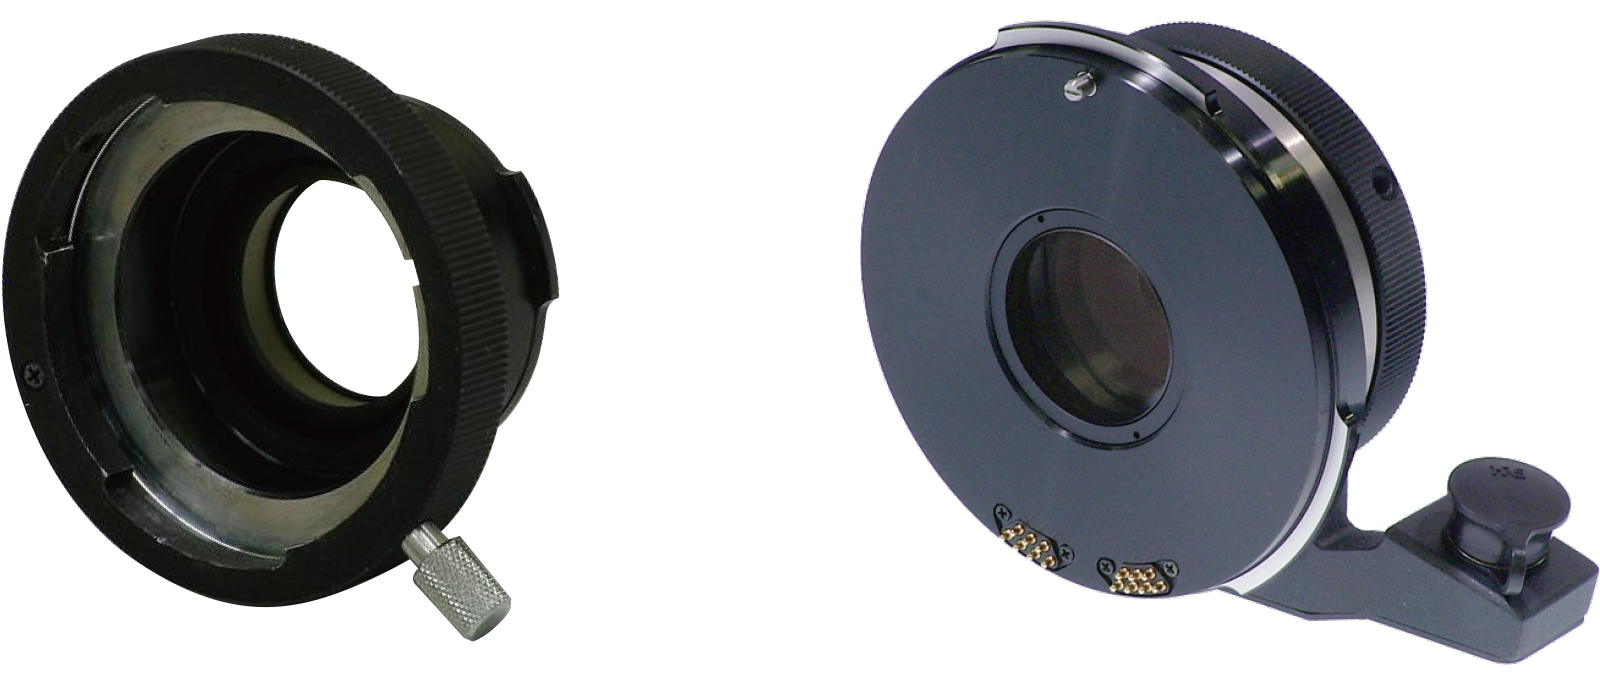 [foto] Dos adaptadores de montaje lado a lado